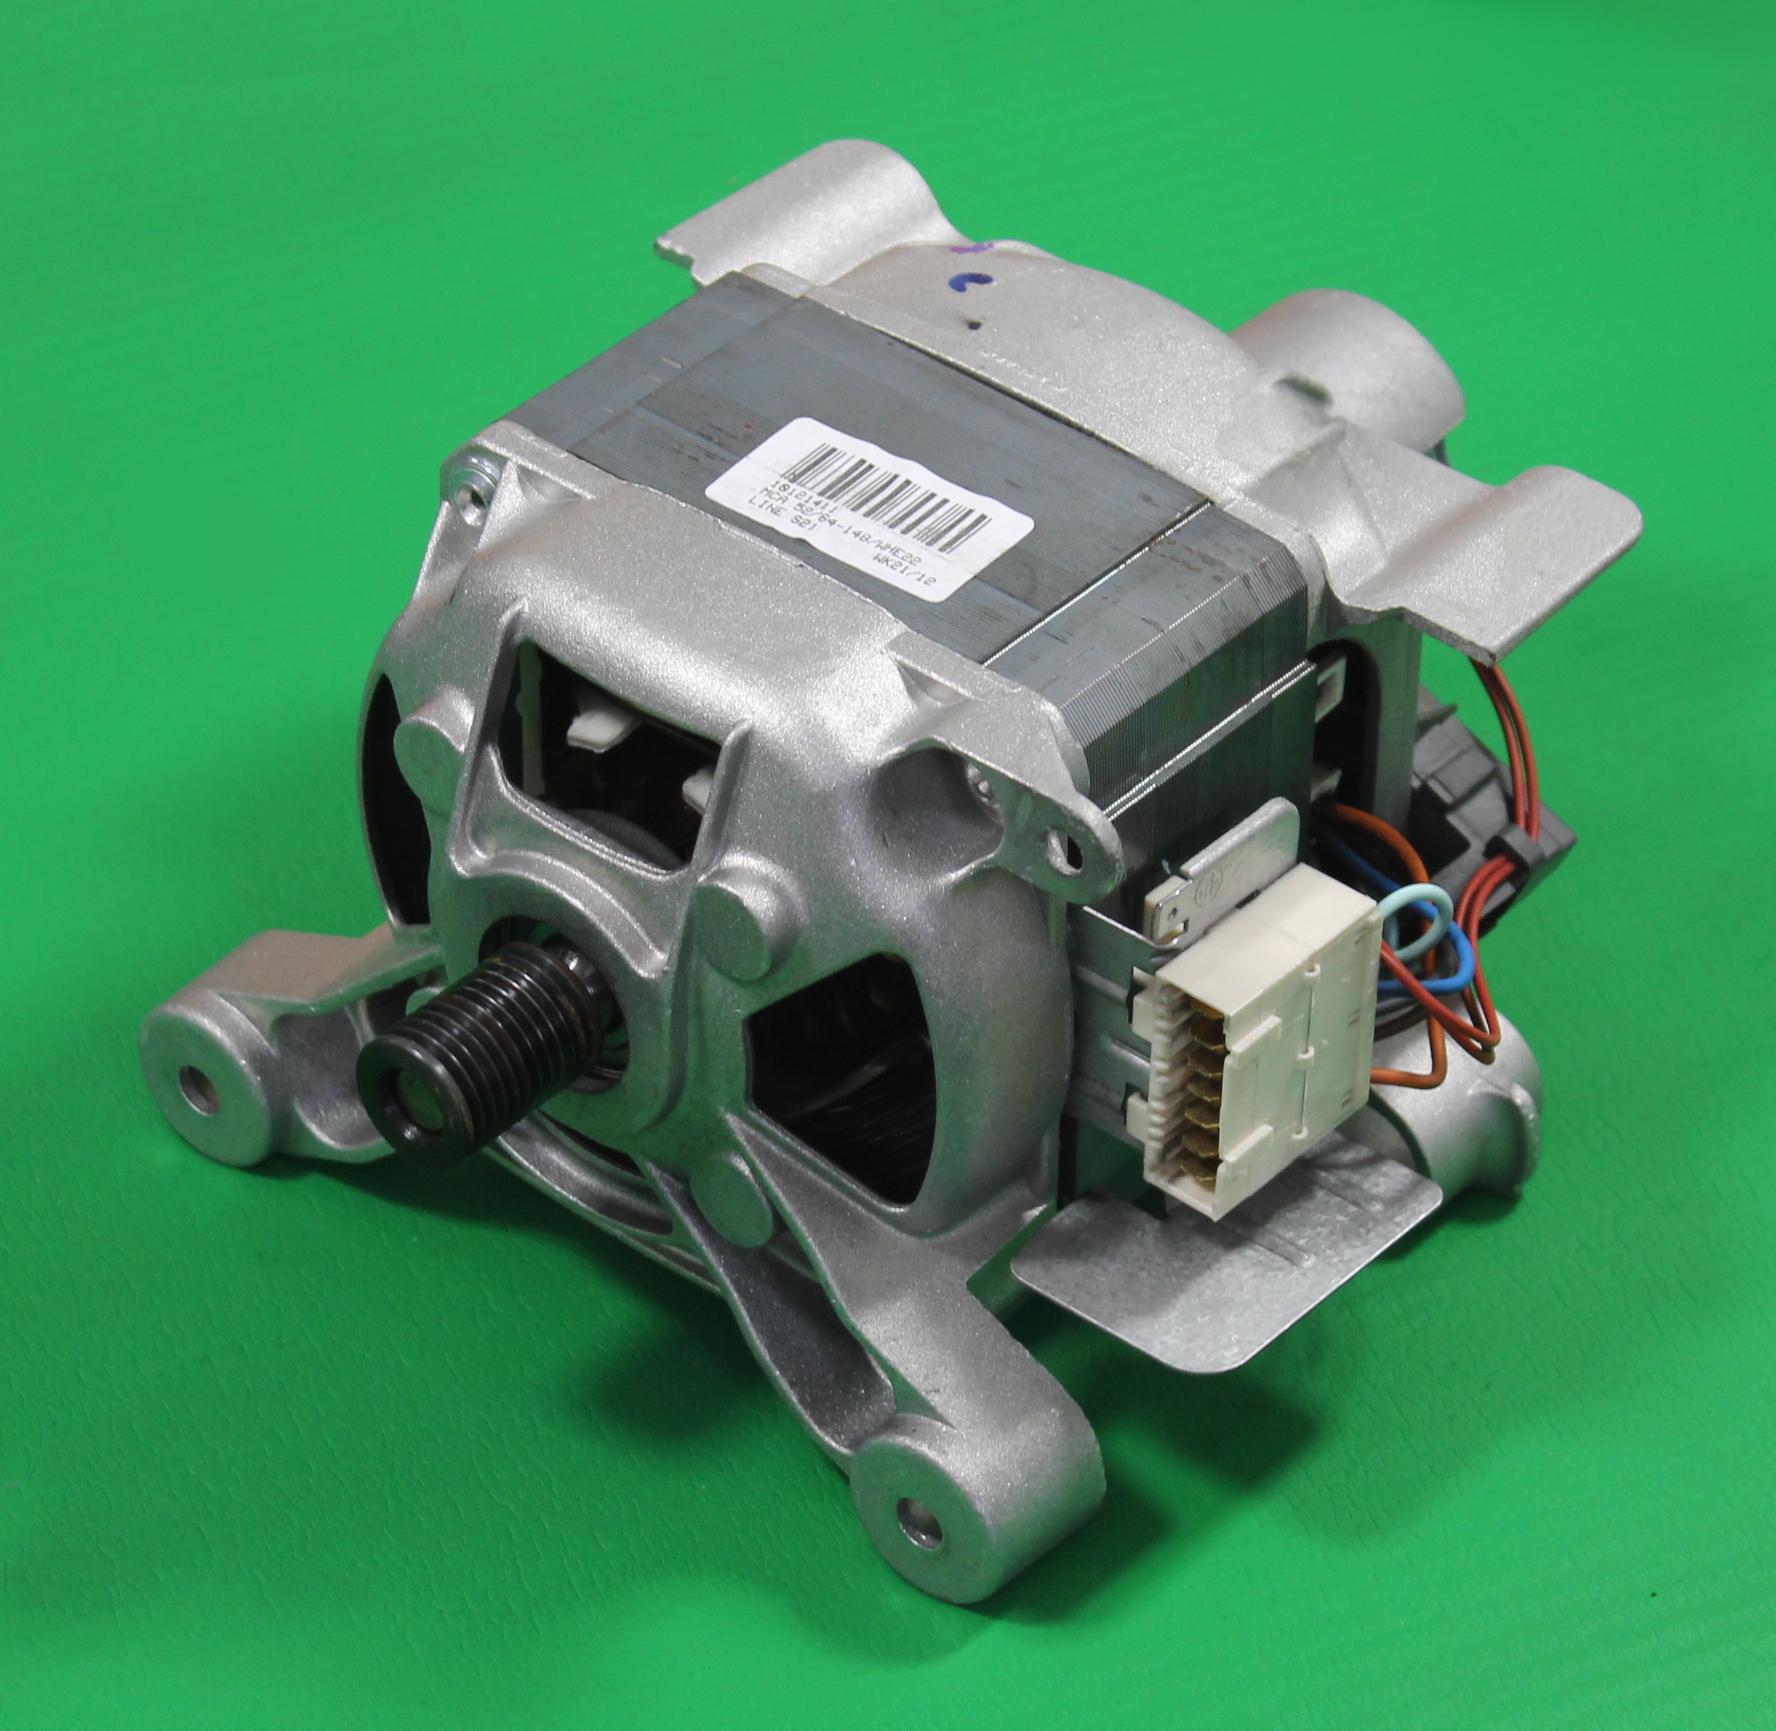 Whirlpool Awo D060 Washing Machine Motor C E Set Mca 52 64